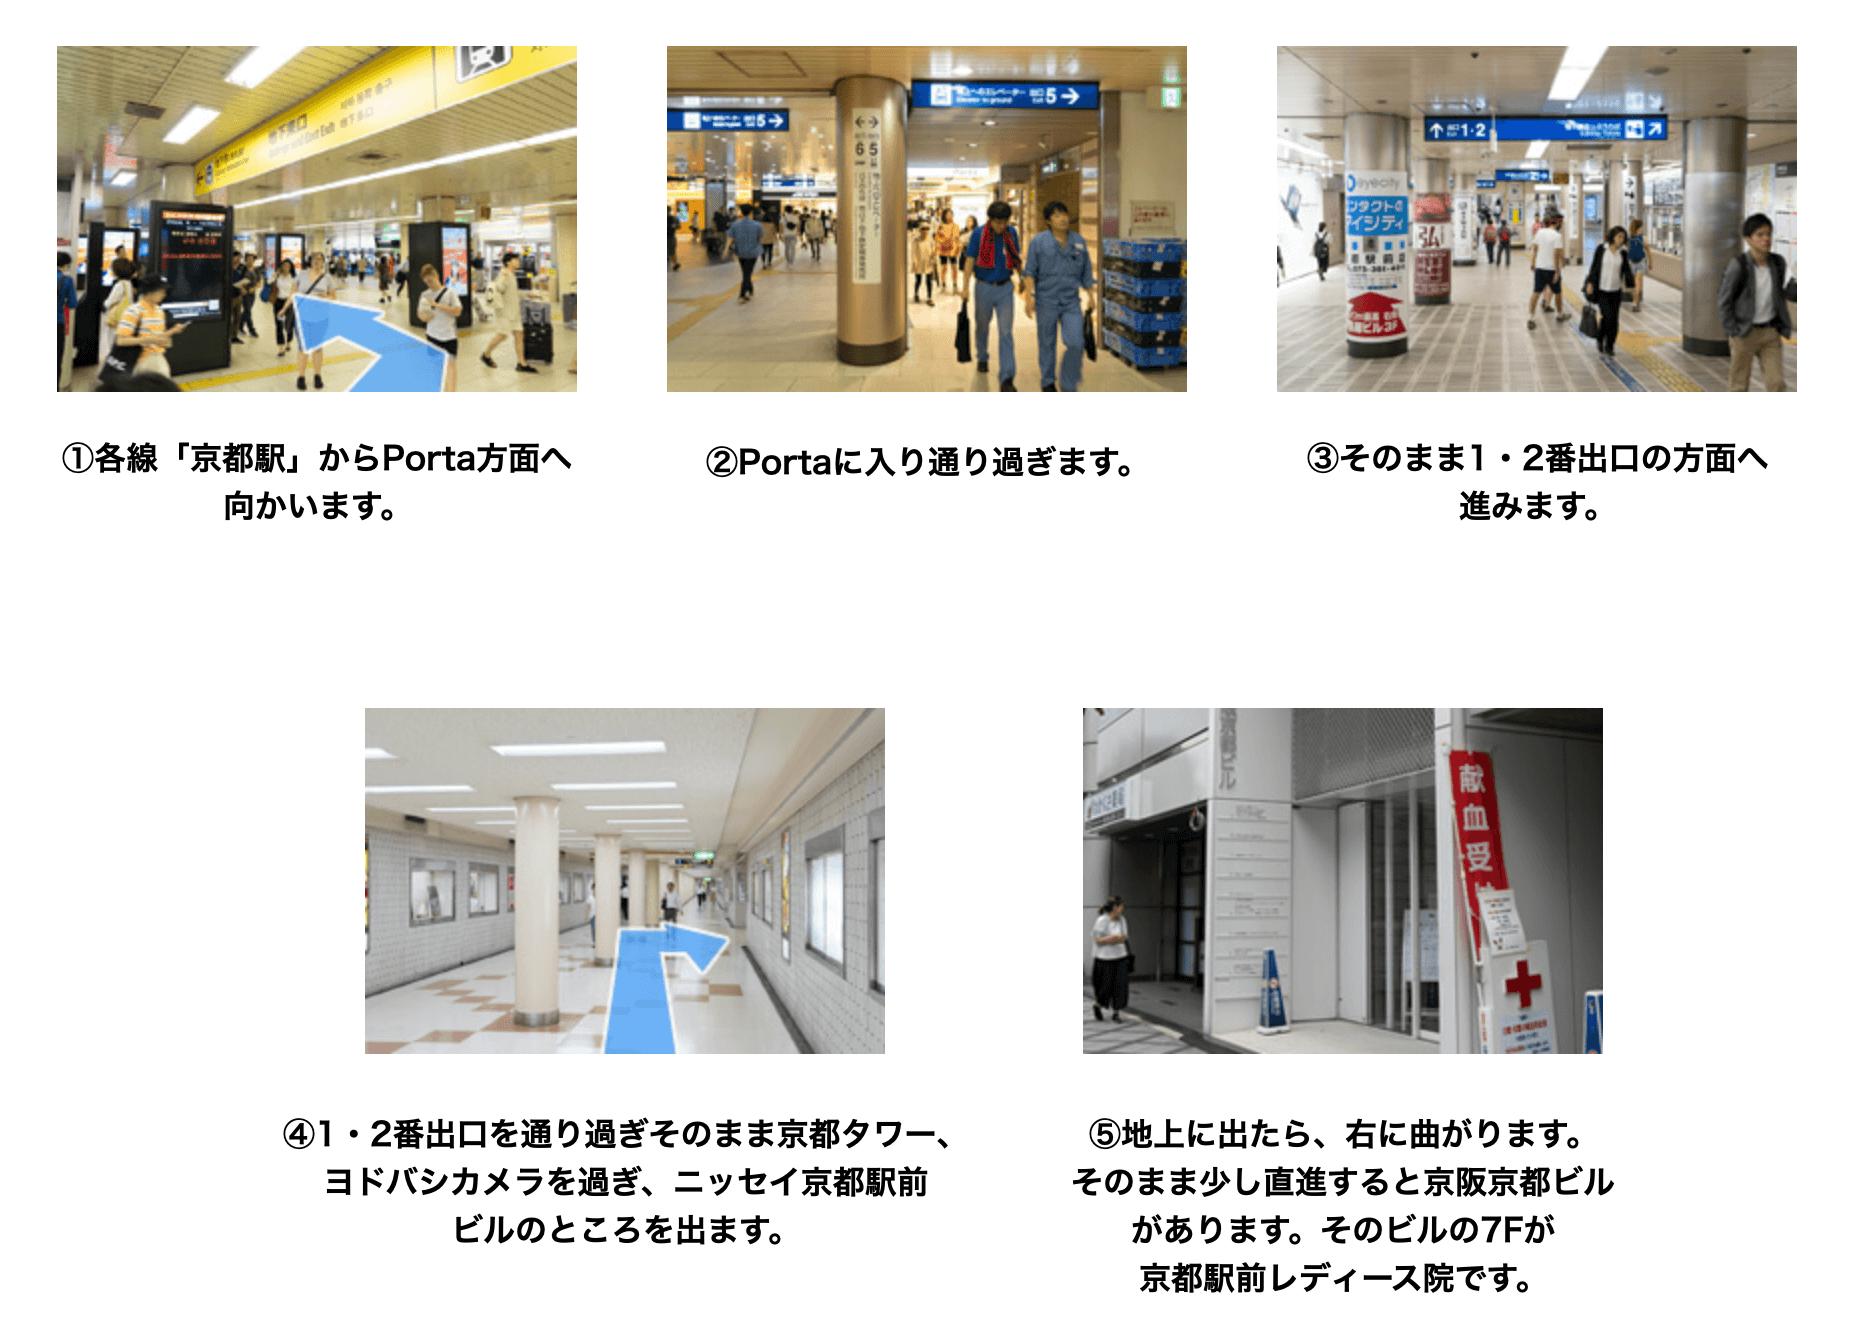 AGAスキンクリニック 京都駅前レディース院に迷わず辿り着くための完全MAP